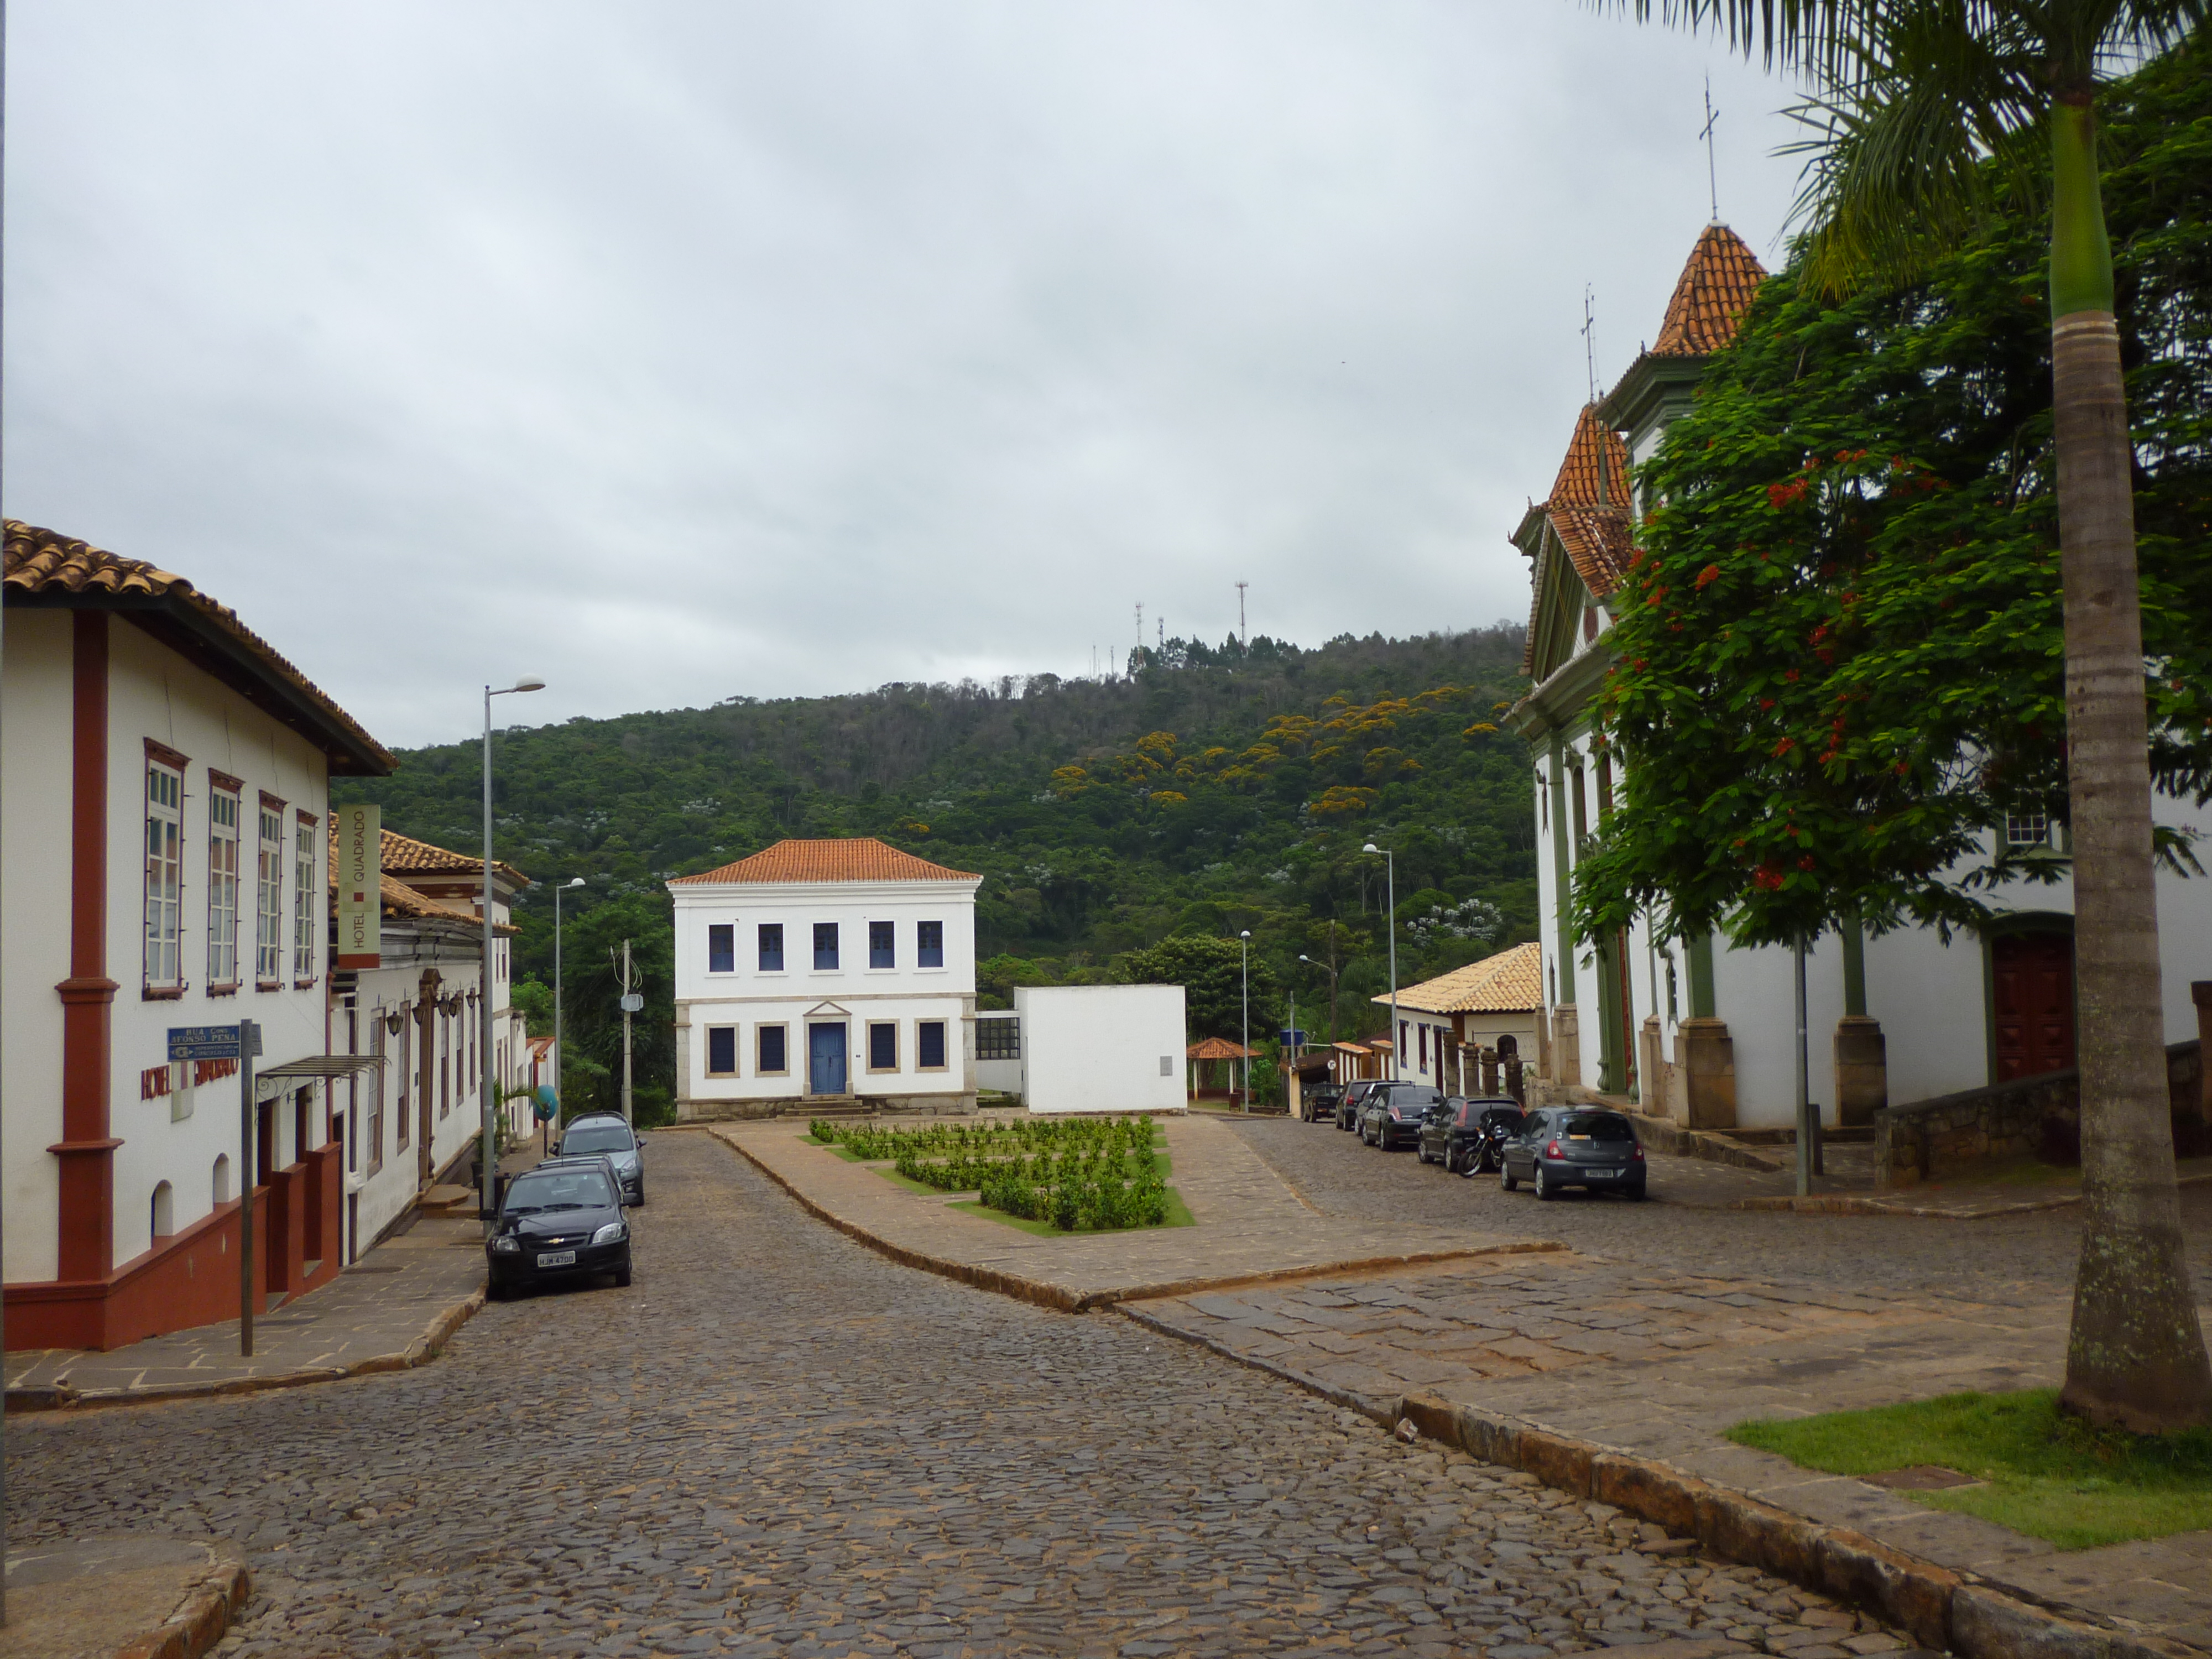 Santa Bárbara Minas Gerais fonte: upload.wikimedia.org